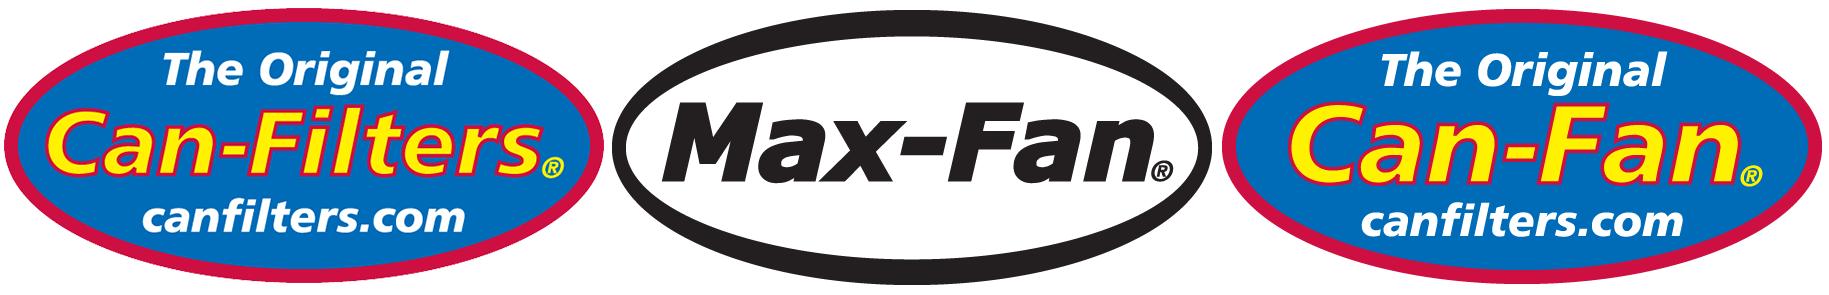 Can-Filters Max-Fan Can-Fan Logos Banner